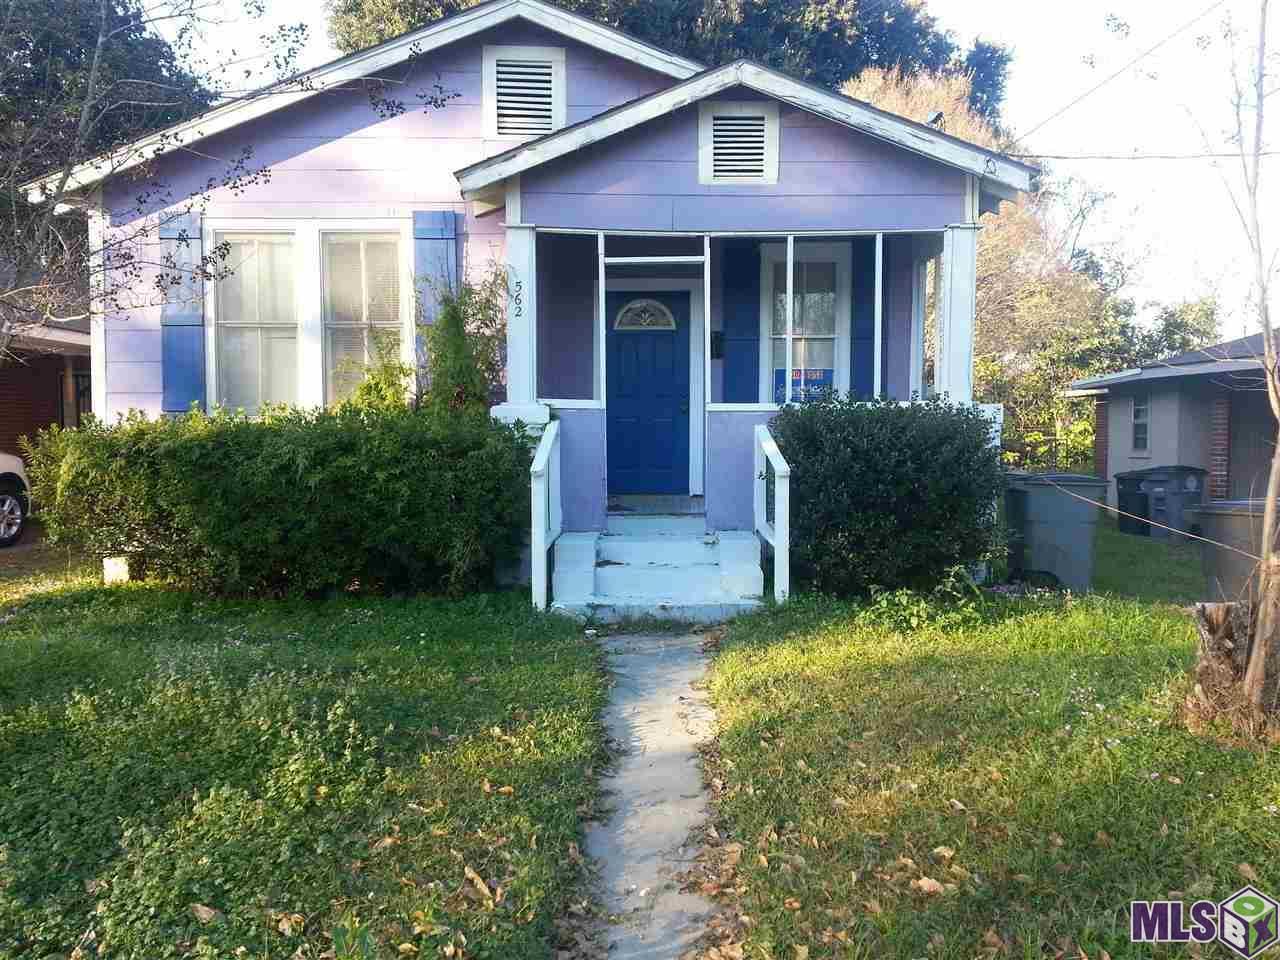 562 W GRANT ST, Baton Rouge, LA 70802